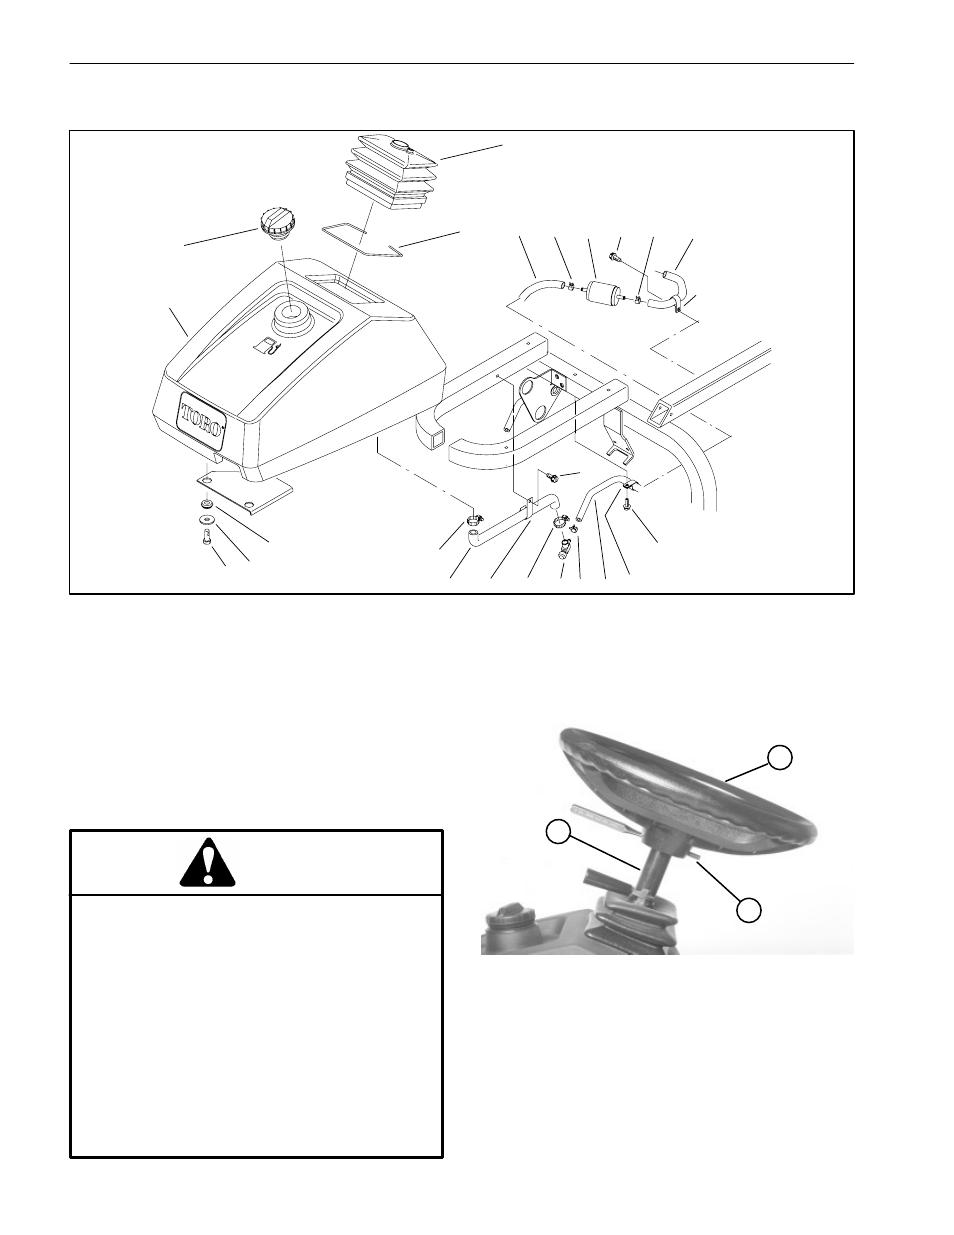 Fuel Tank Sp 5020 Danger Toro Sand Pro User Manual Page Grommet 3 1 Engine Diagram 40 170